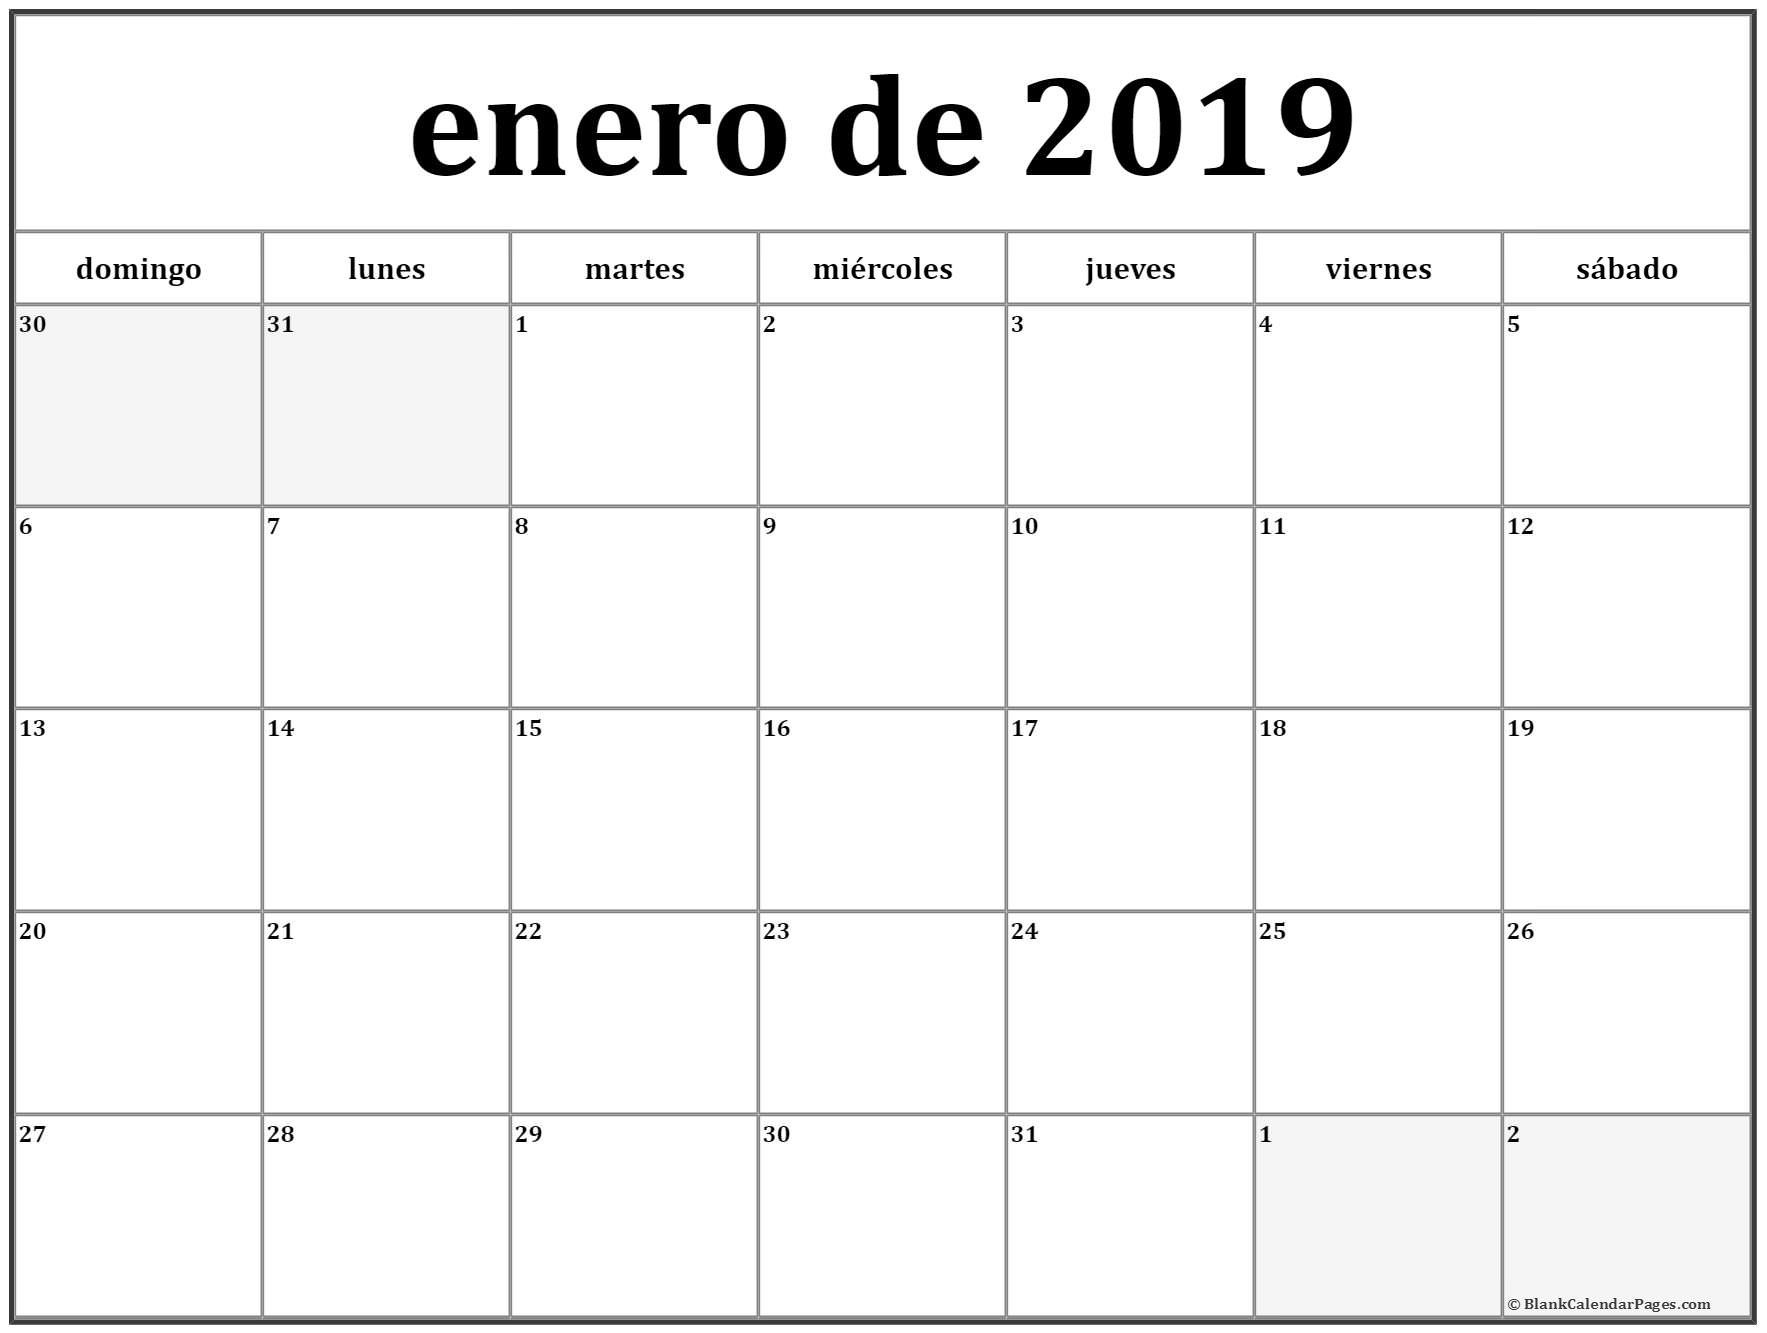 Calendario 2019 Para Imprimir Por Mes Más Recientes Informes Calendario 2019 Para Imprimir Con Festivos Espa±a